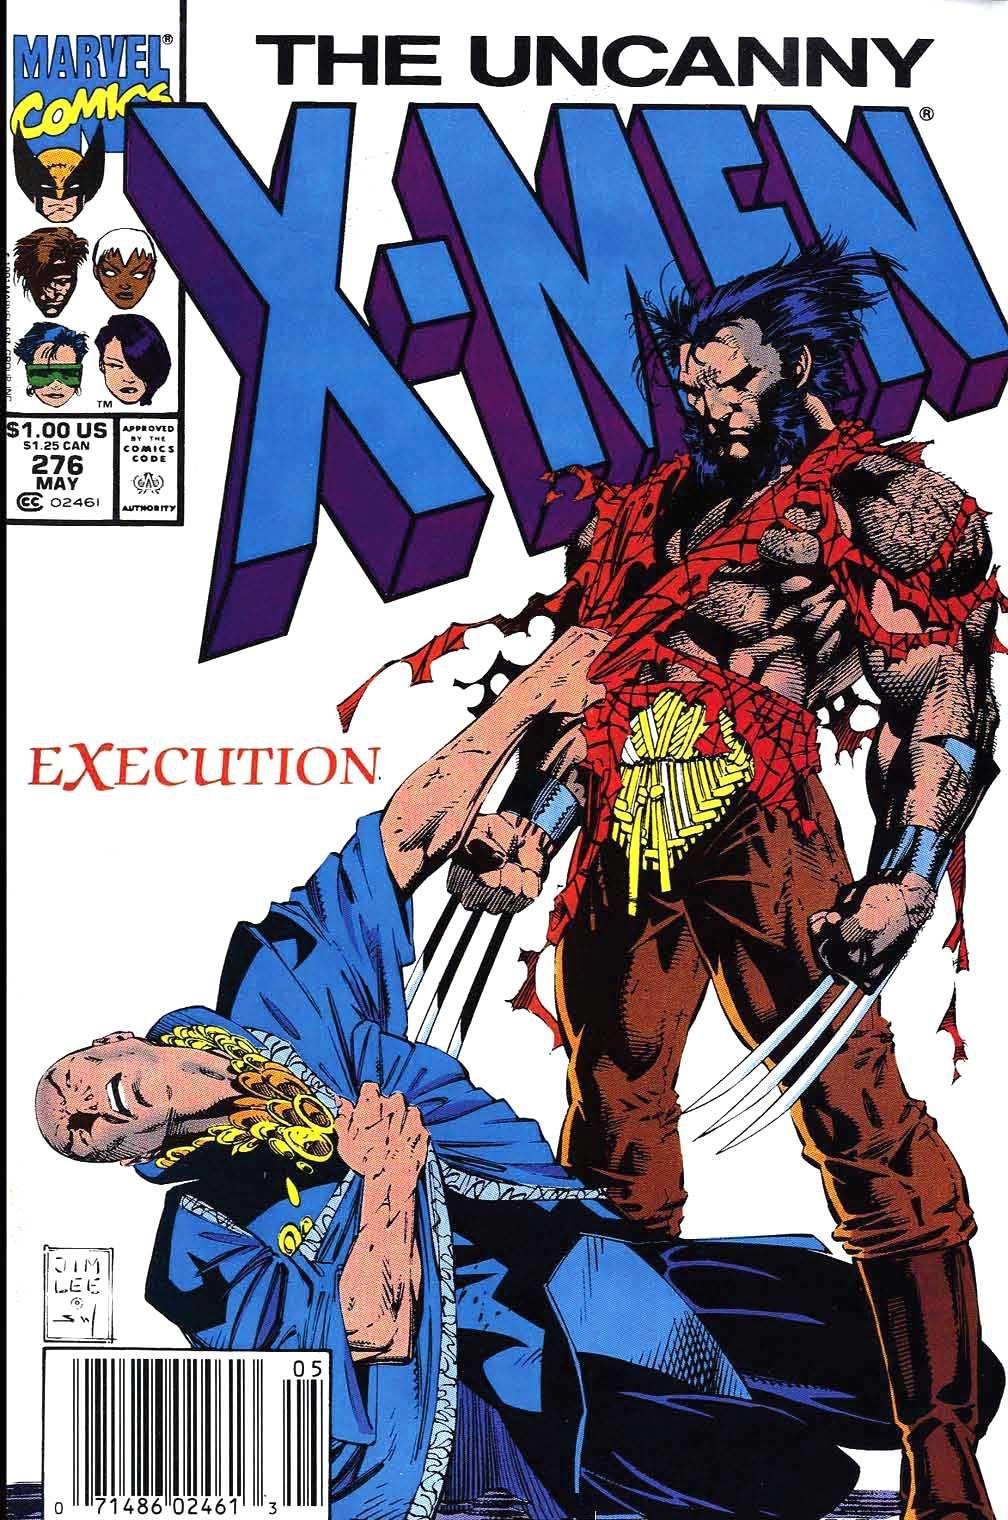 The Uncanny X Men Vol 1 276 By Jim Lee Scott Williams And Pat Brosseau Wolverine Professorx Marvel Comics Covers Comic Books Art Comics